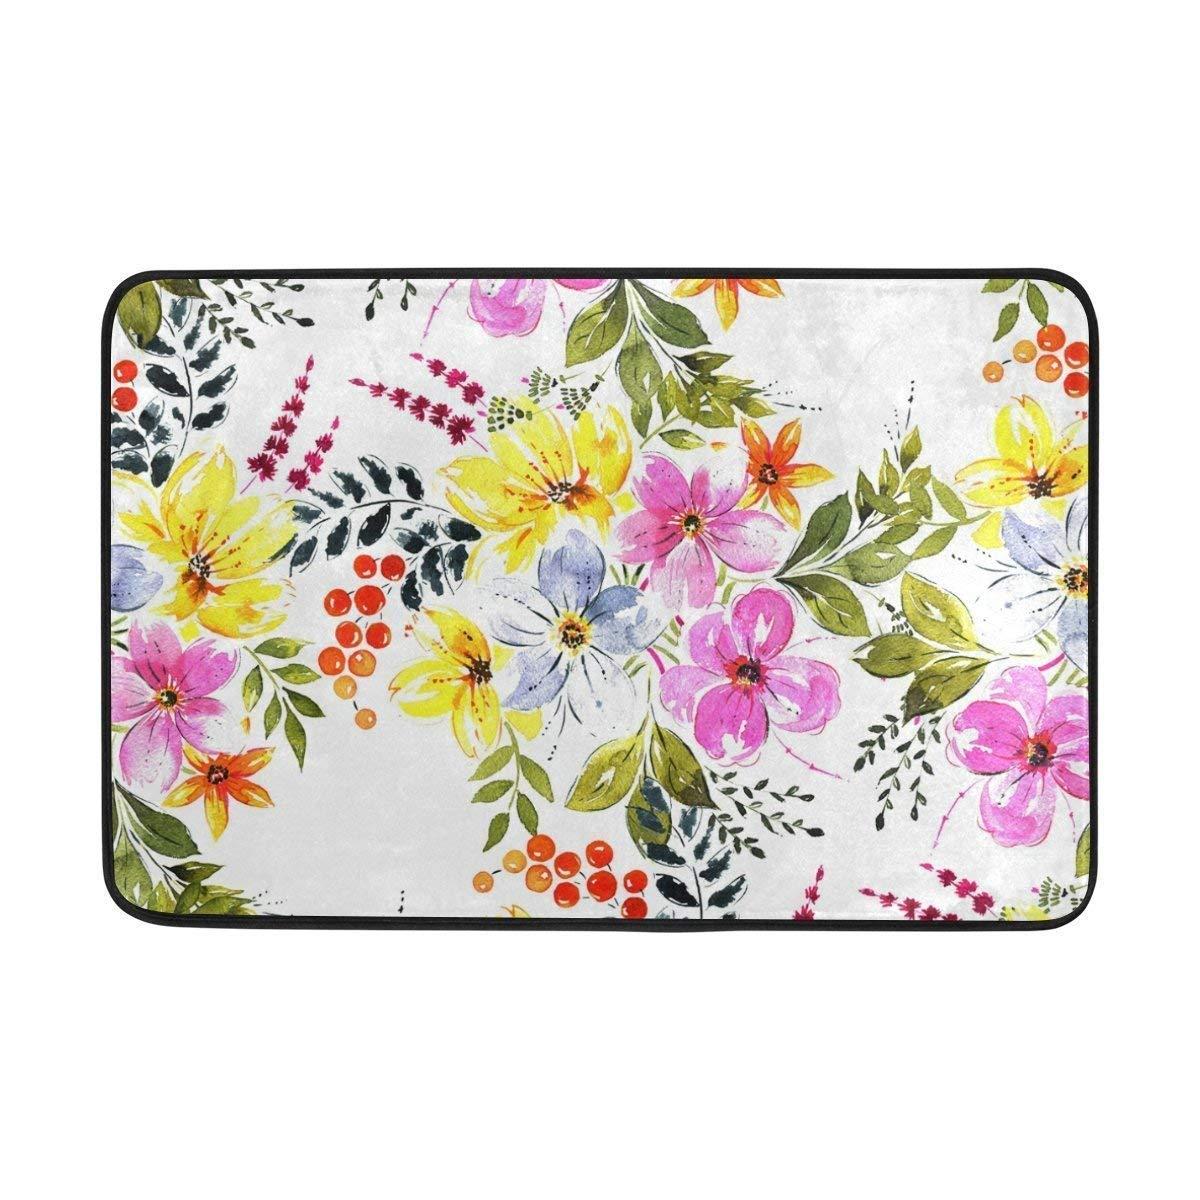 No Soy Como Tu Felpudos Vintage Floral Flowers Spring Summer Oil Painting Doormats Floor Mats Shoe Scraper for Home Indoor Entrance Way Front Door 23.6 by 15.7 Inches 40 x 60 cm